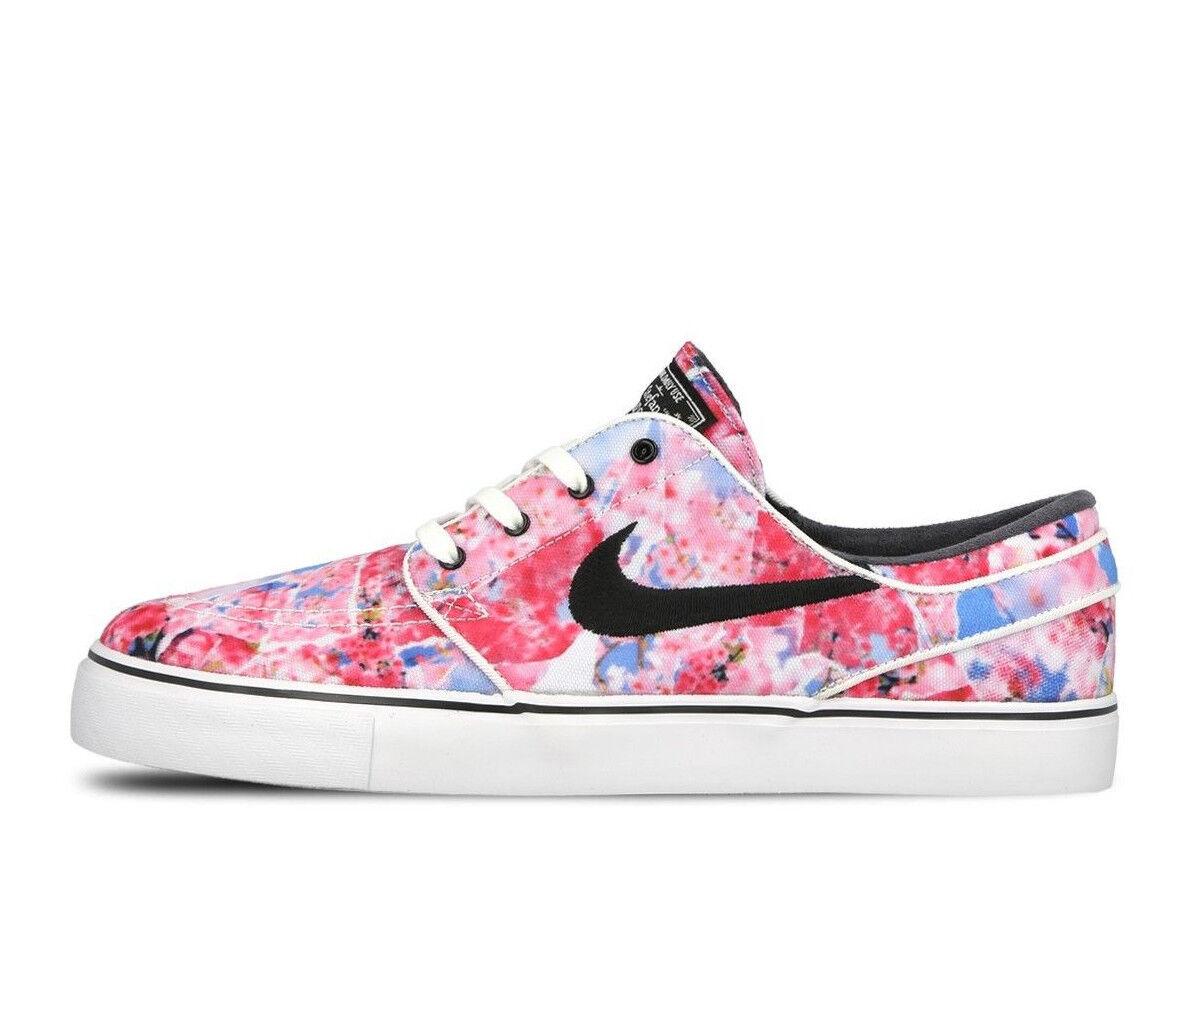 Nike SB Zoom Blanco Stefan Janoski Cherry Blossom Rosa Blanco Zoom Japón 705190602 47db6e